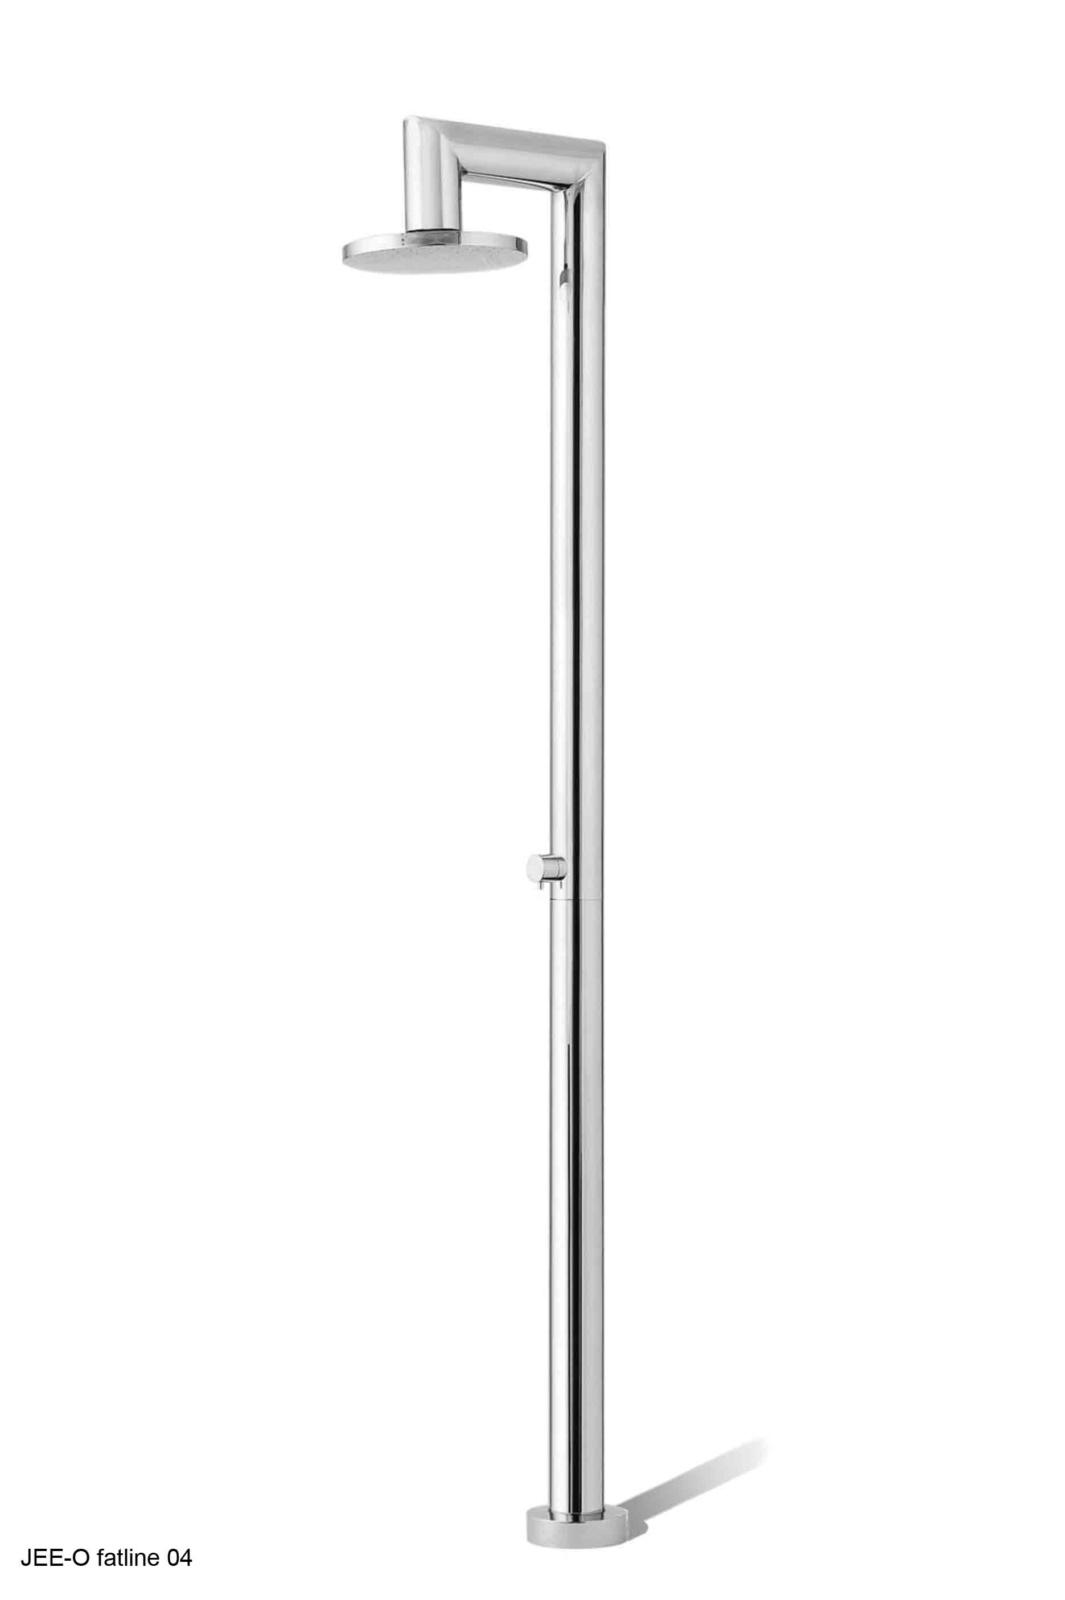 Sprcha JEE-O fatline 04 | broušený nerez Image